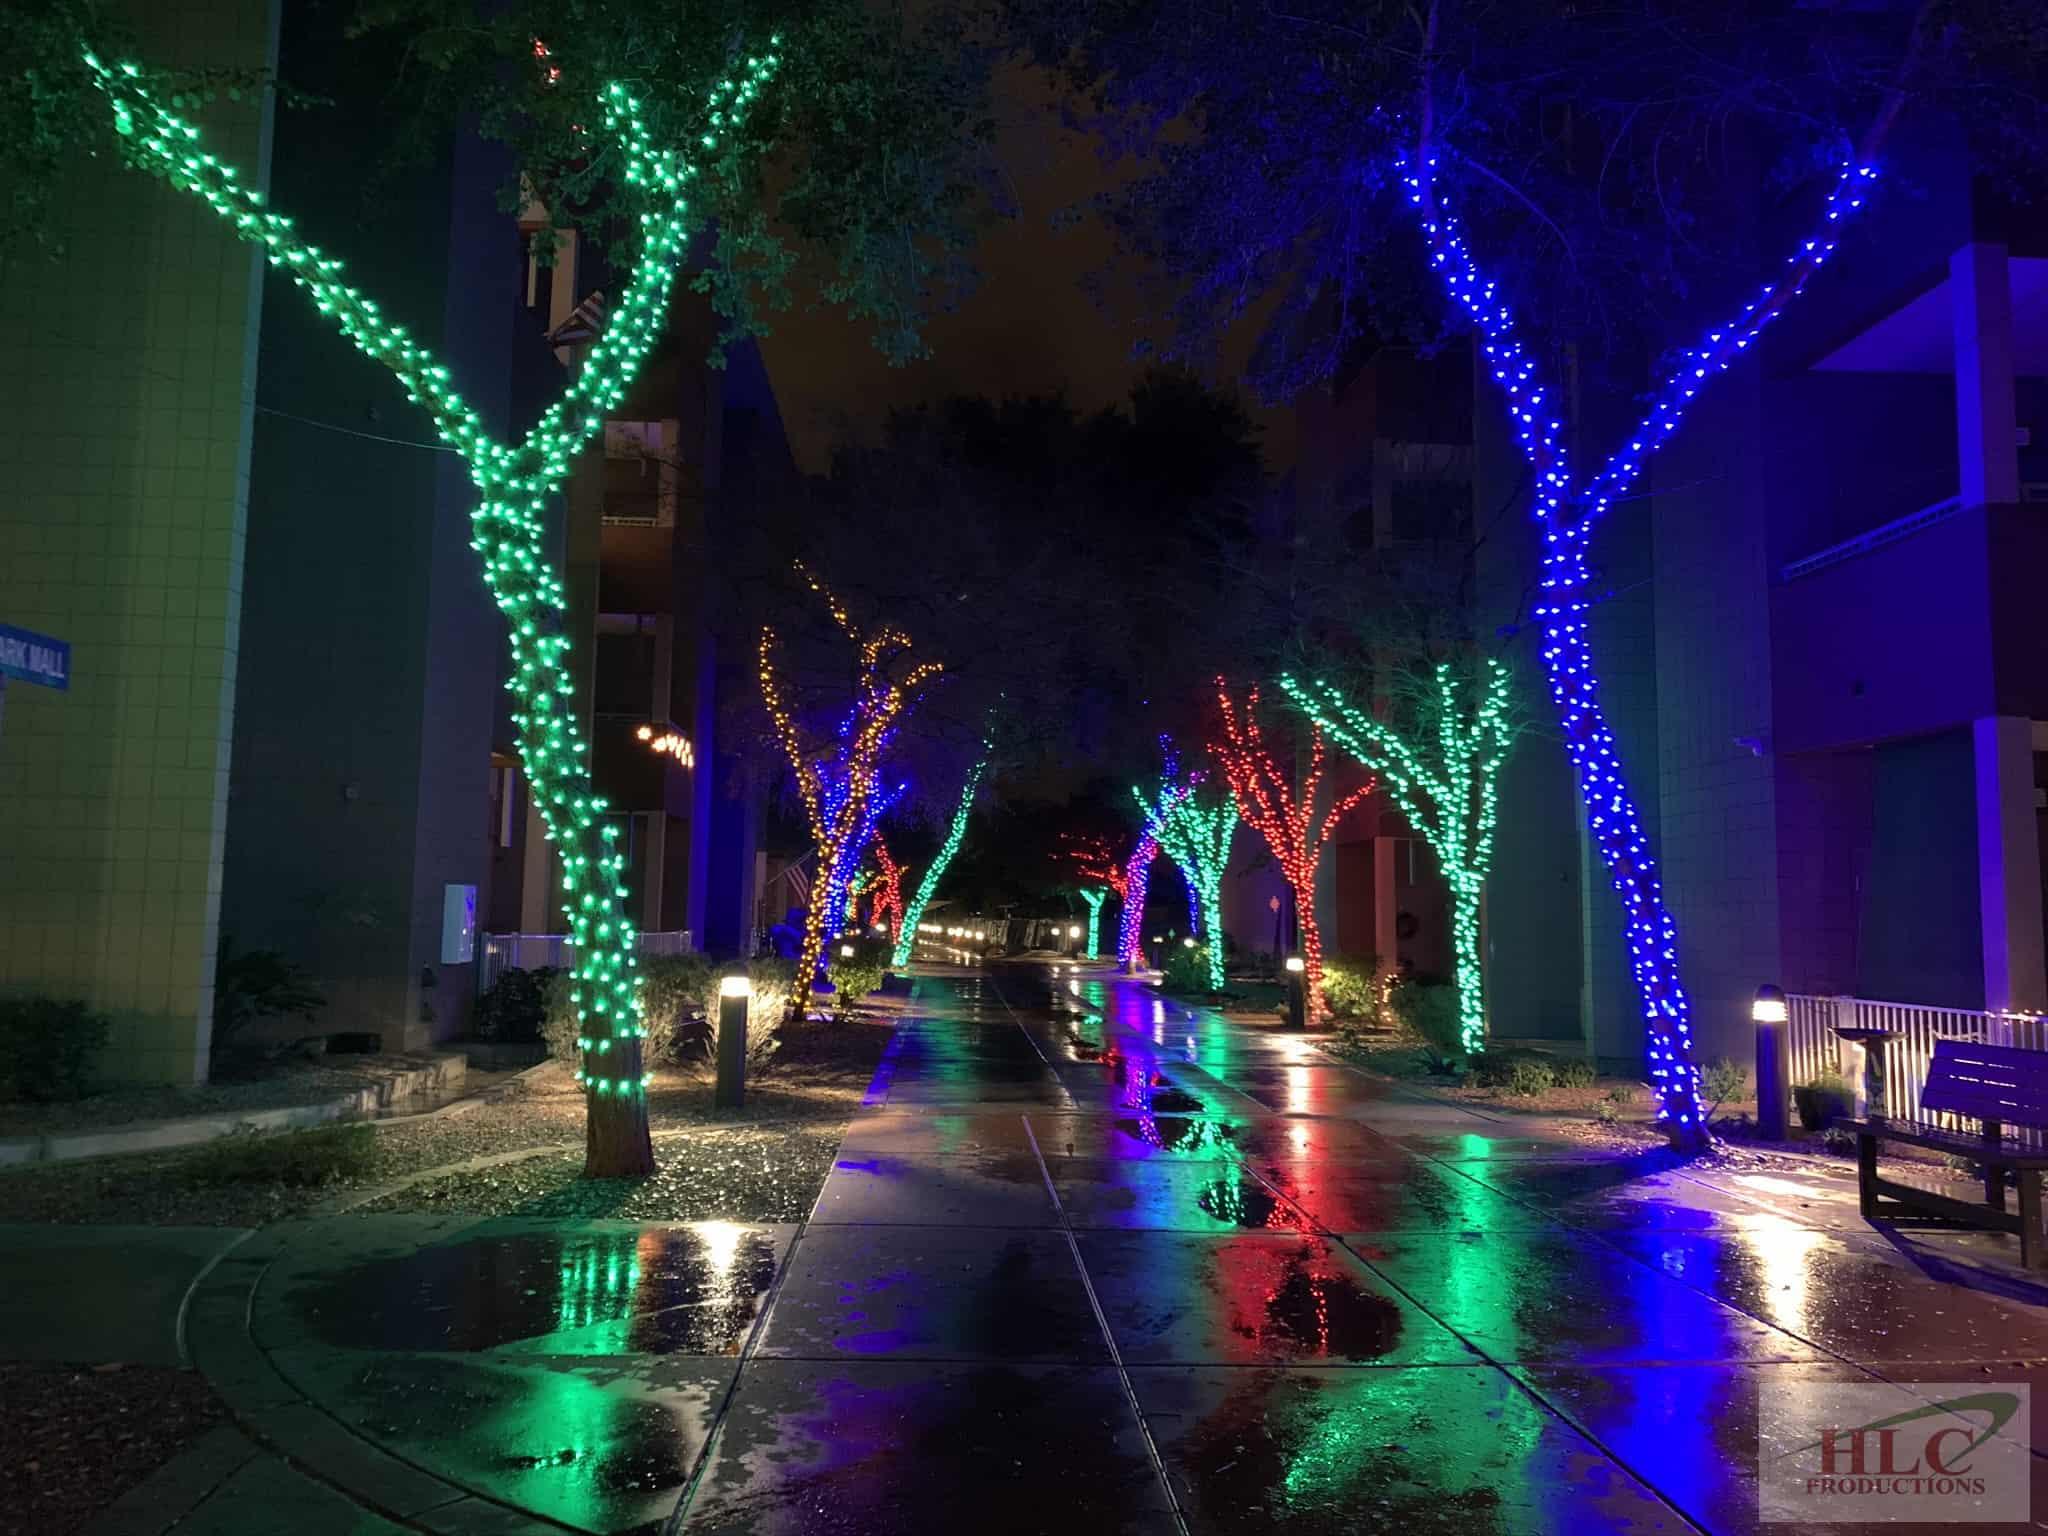 Beatitudes - Multi Colored Trees